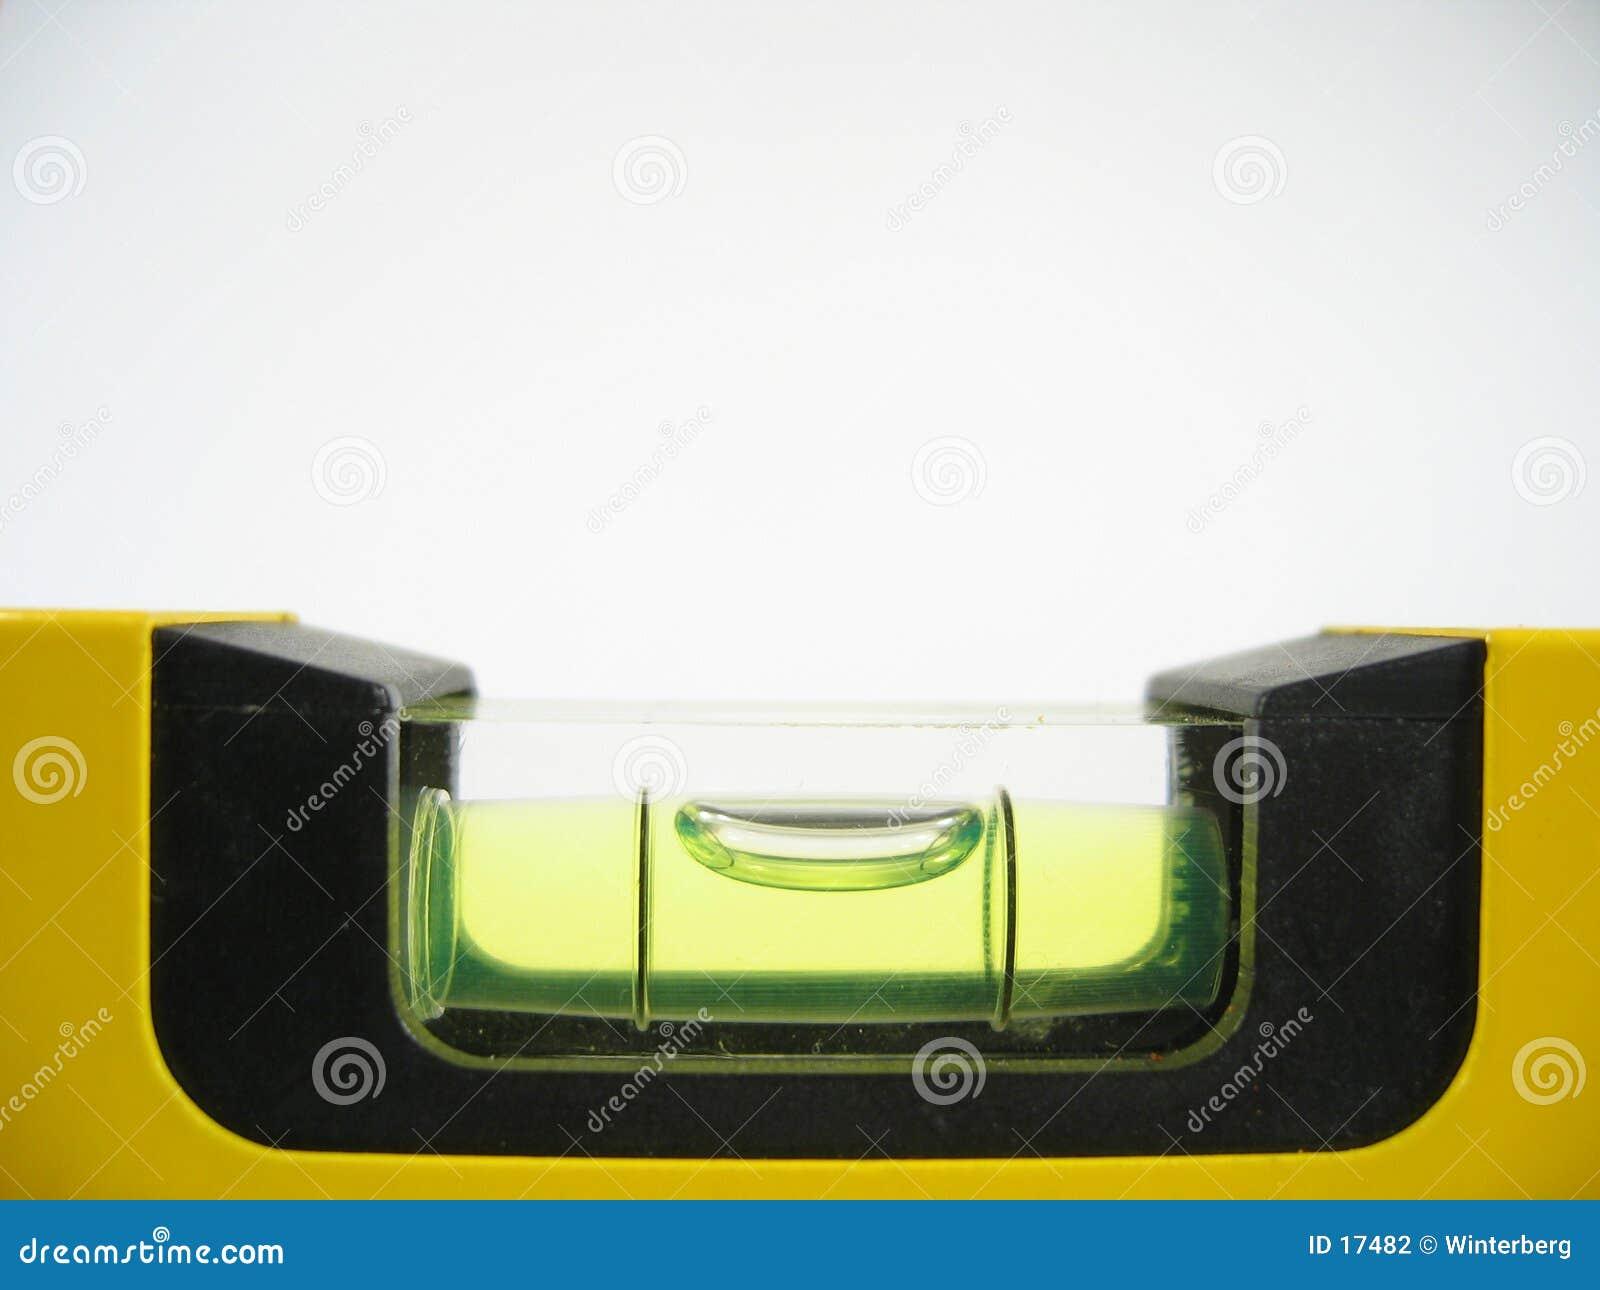 Bubble Tube Close-up